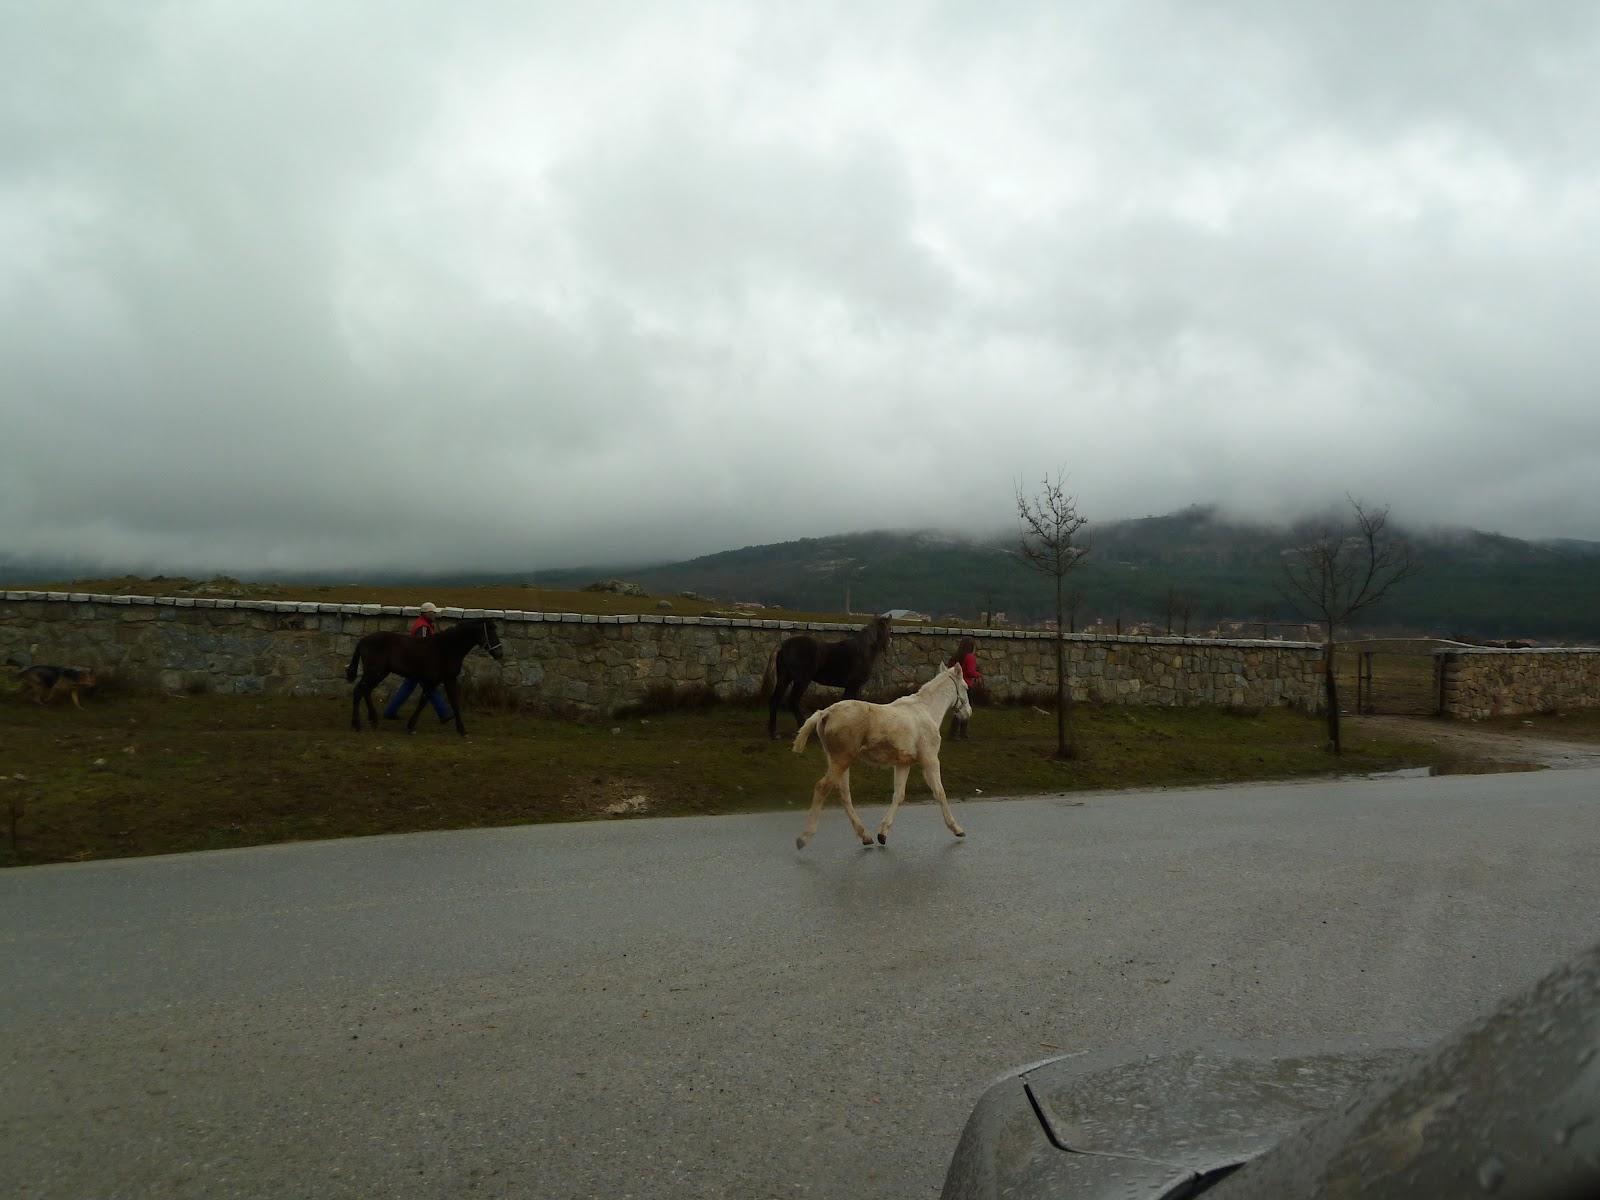 Paseo y chupa bajo la lluvia - 3 part 6